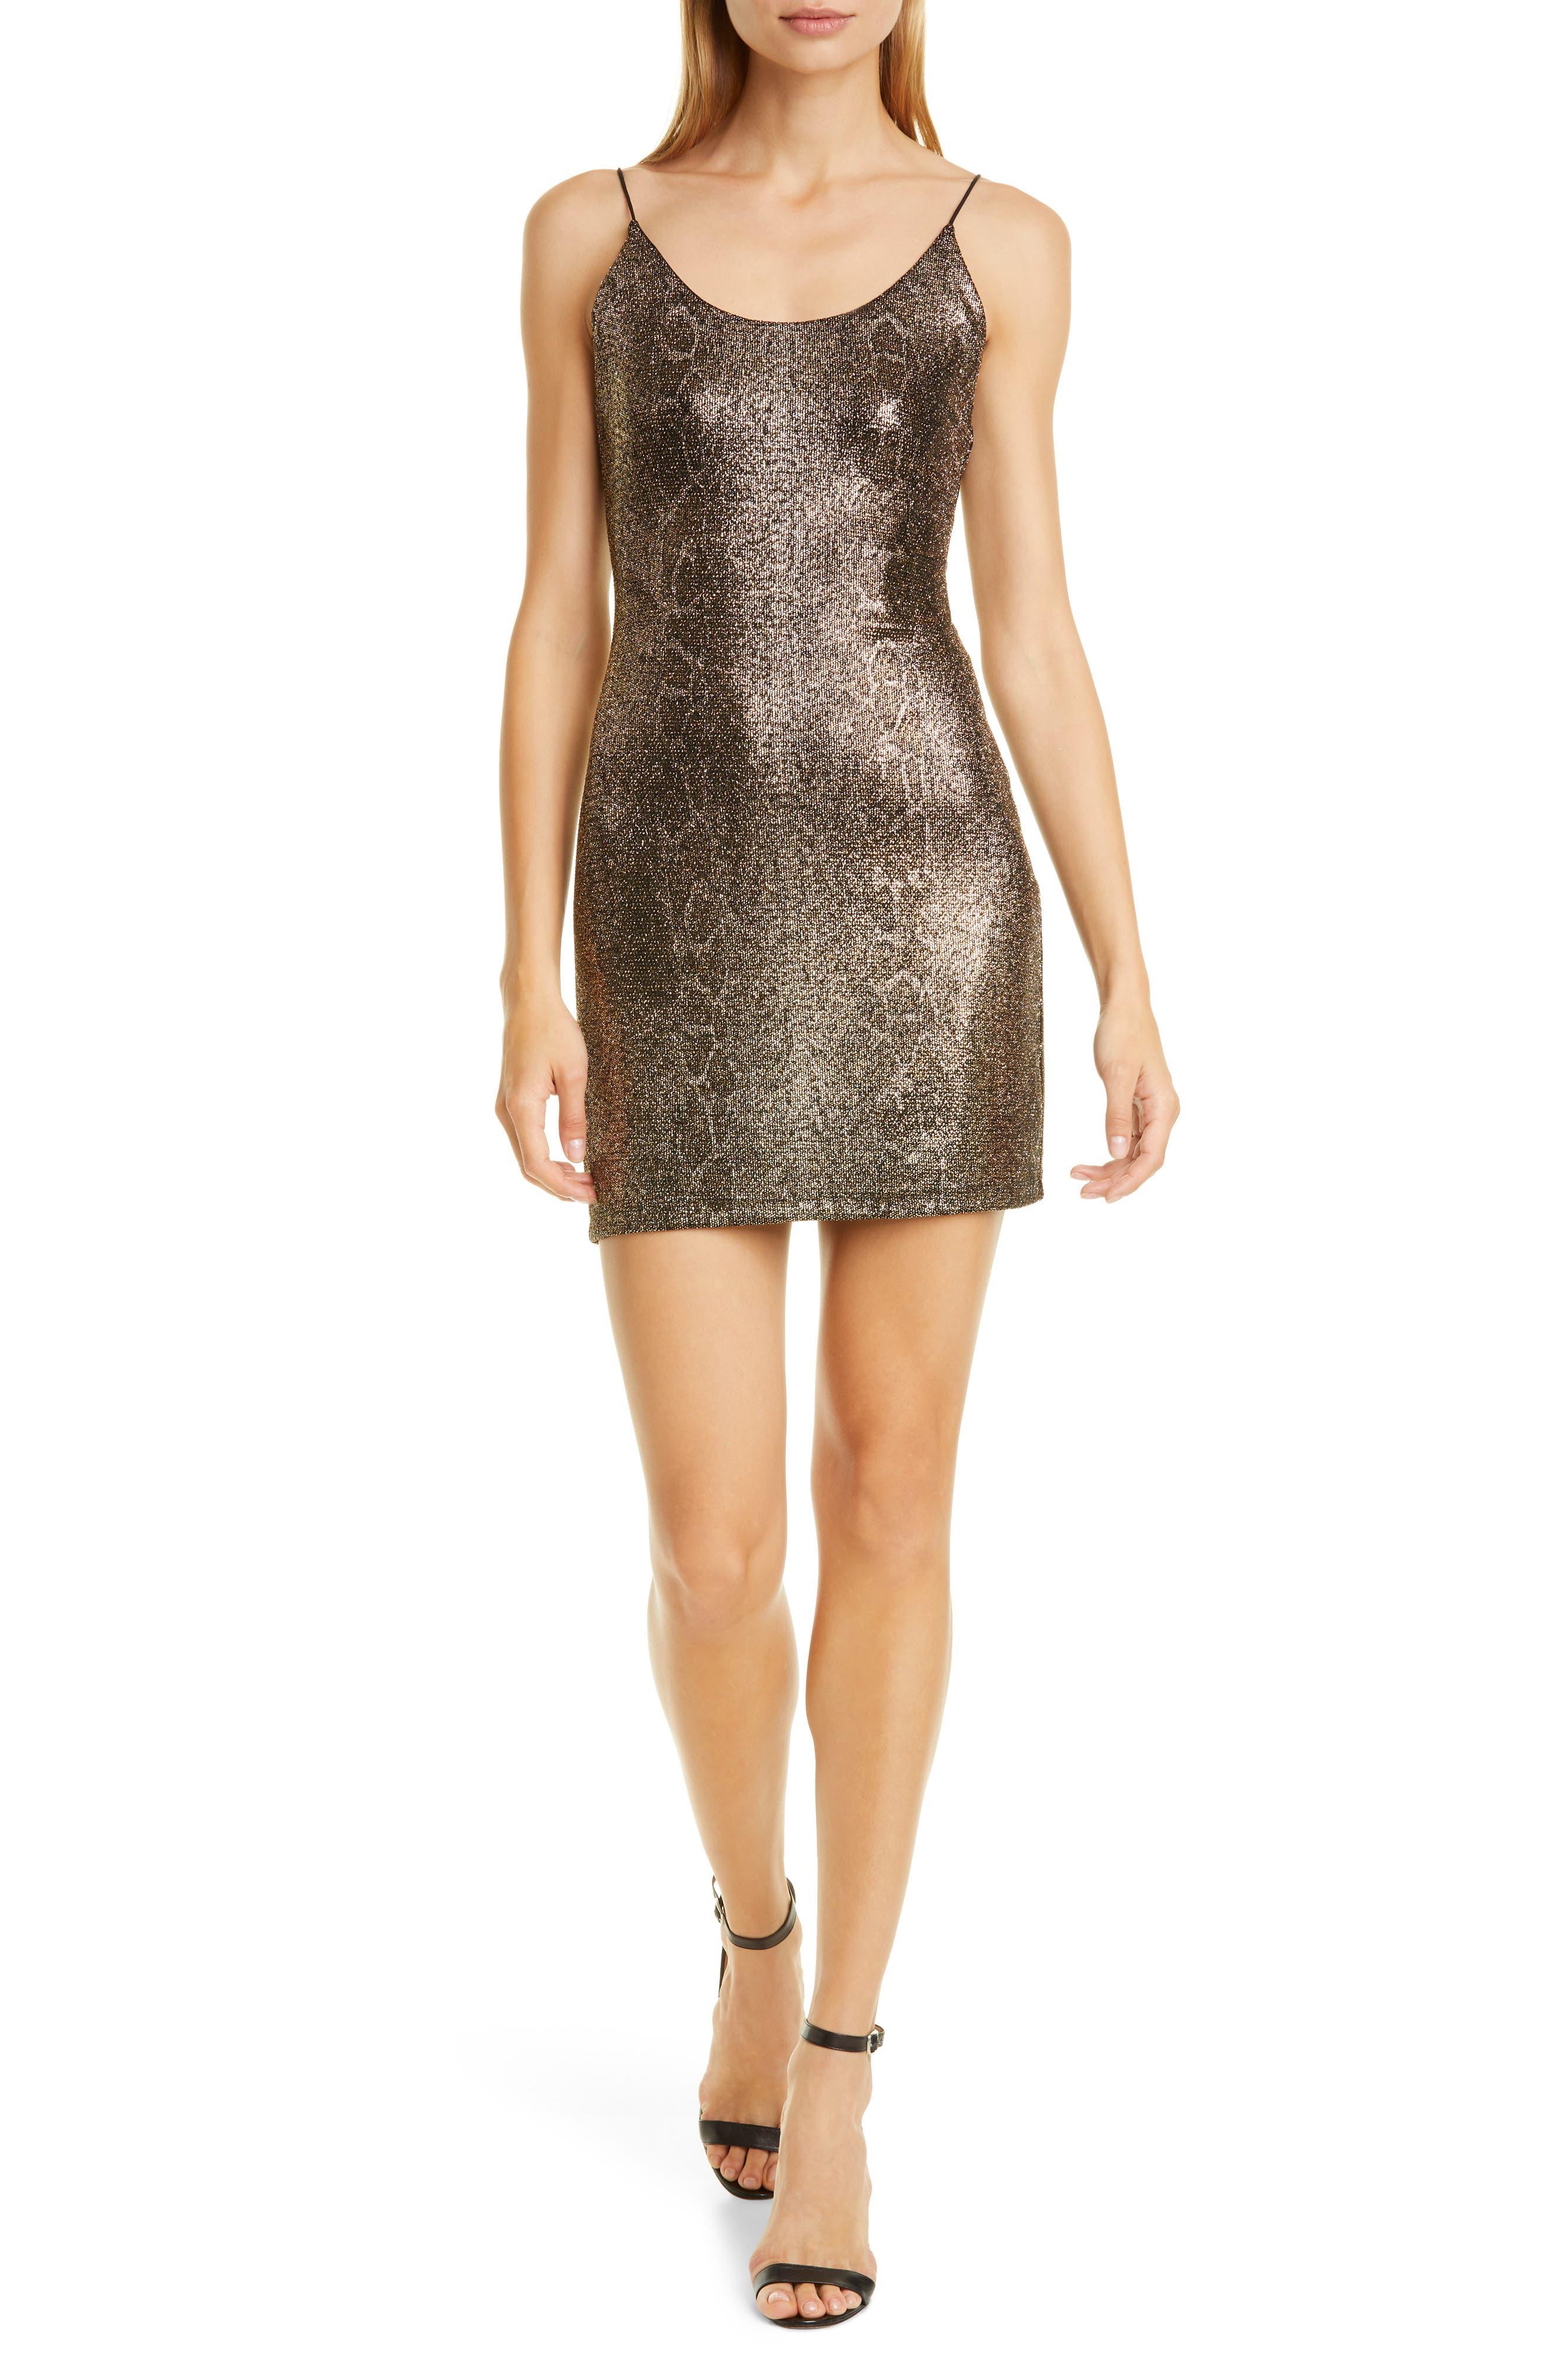 Alice + Olivia Delora Metallic Snake Print Body-Con Minidress, Metallic